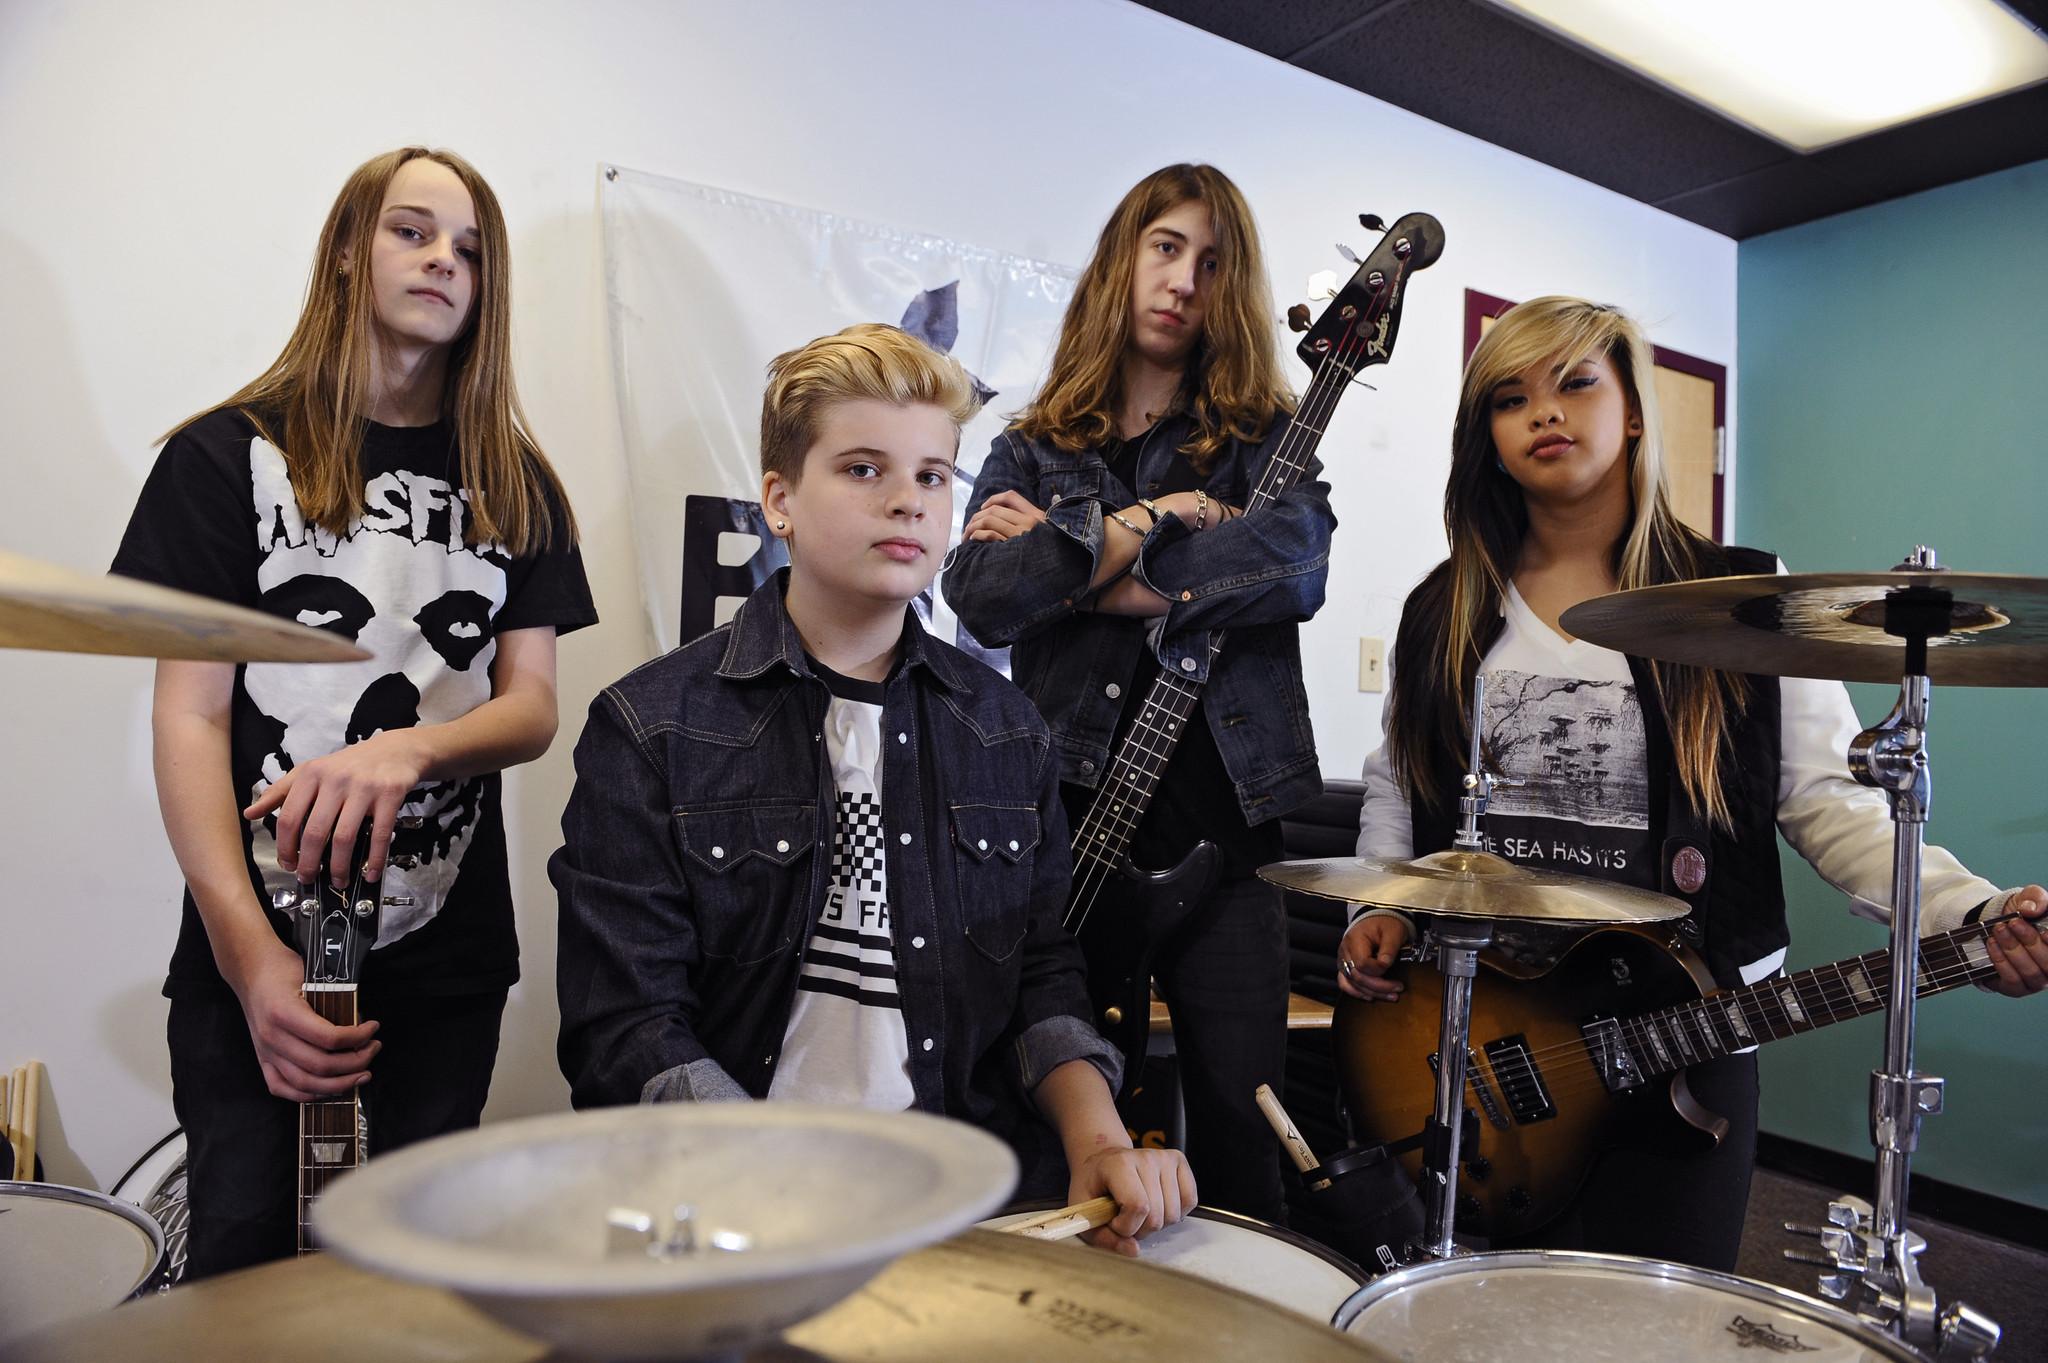 Maryland Band Bad Seed Rising Not The Average Kid Group